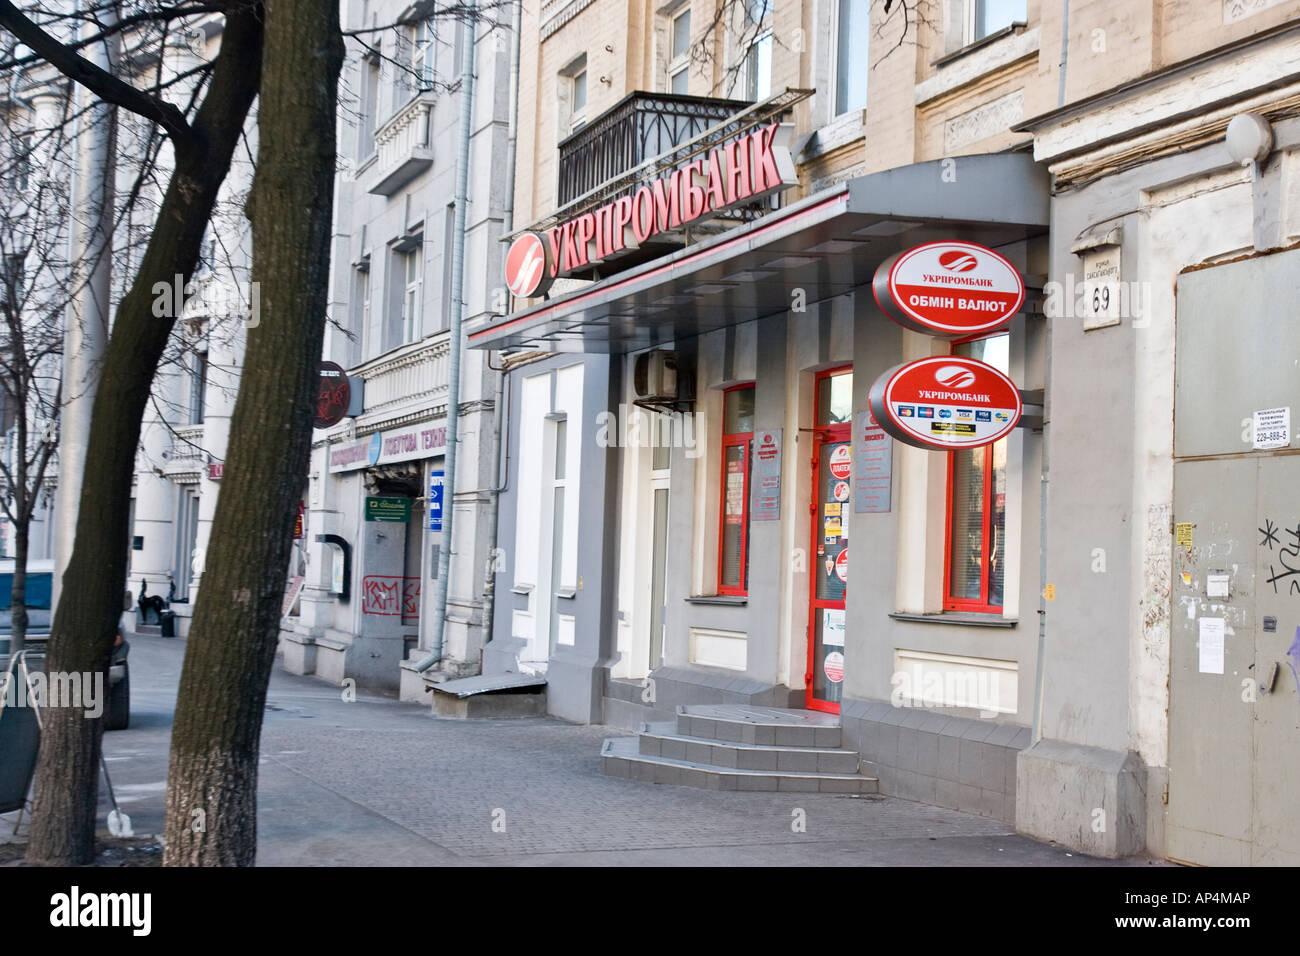 Branch office of the russian Ukrainsky Promyslovy Bank Ukrprombank is seen at night in Kiev, Ukraine - Stock Image